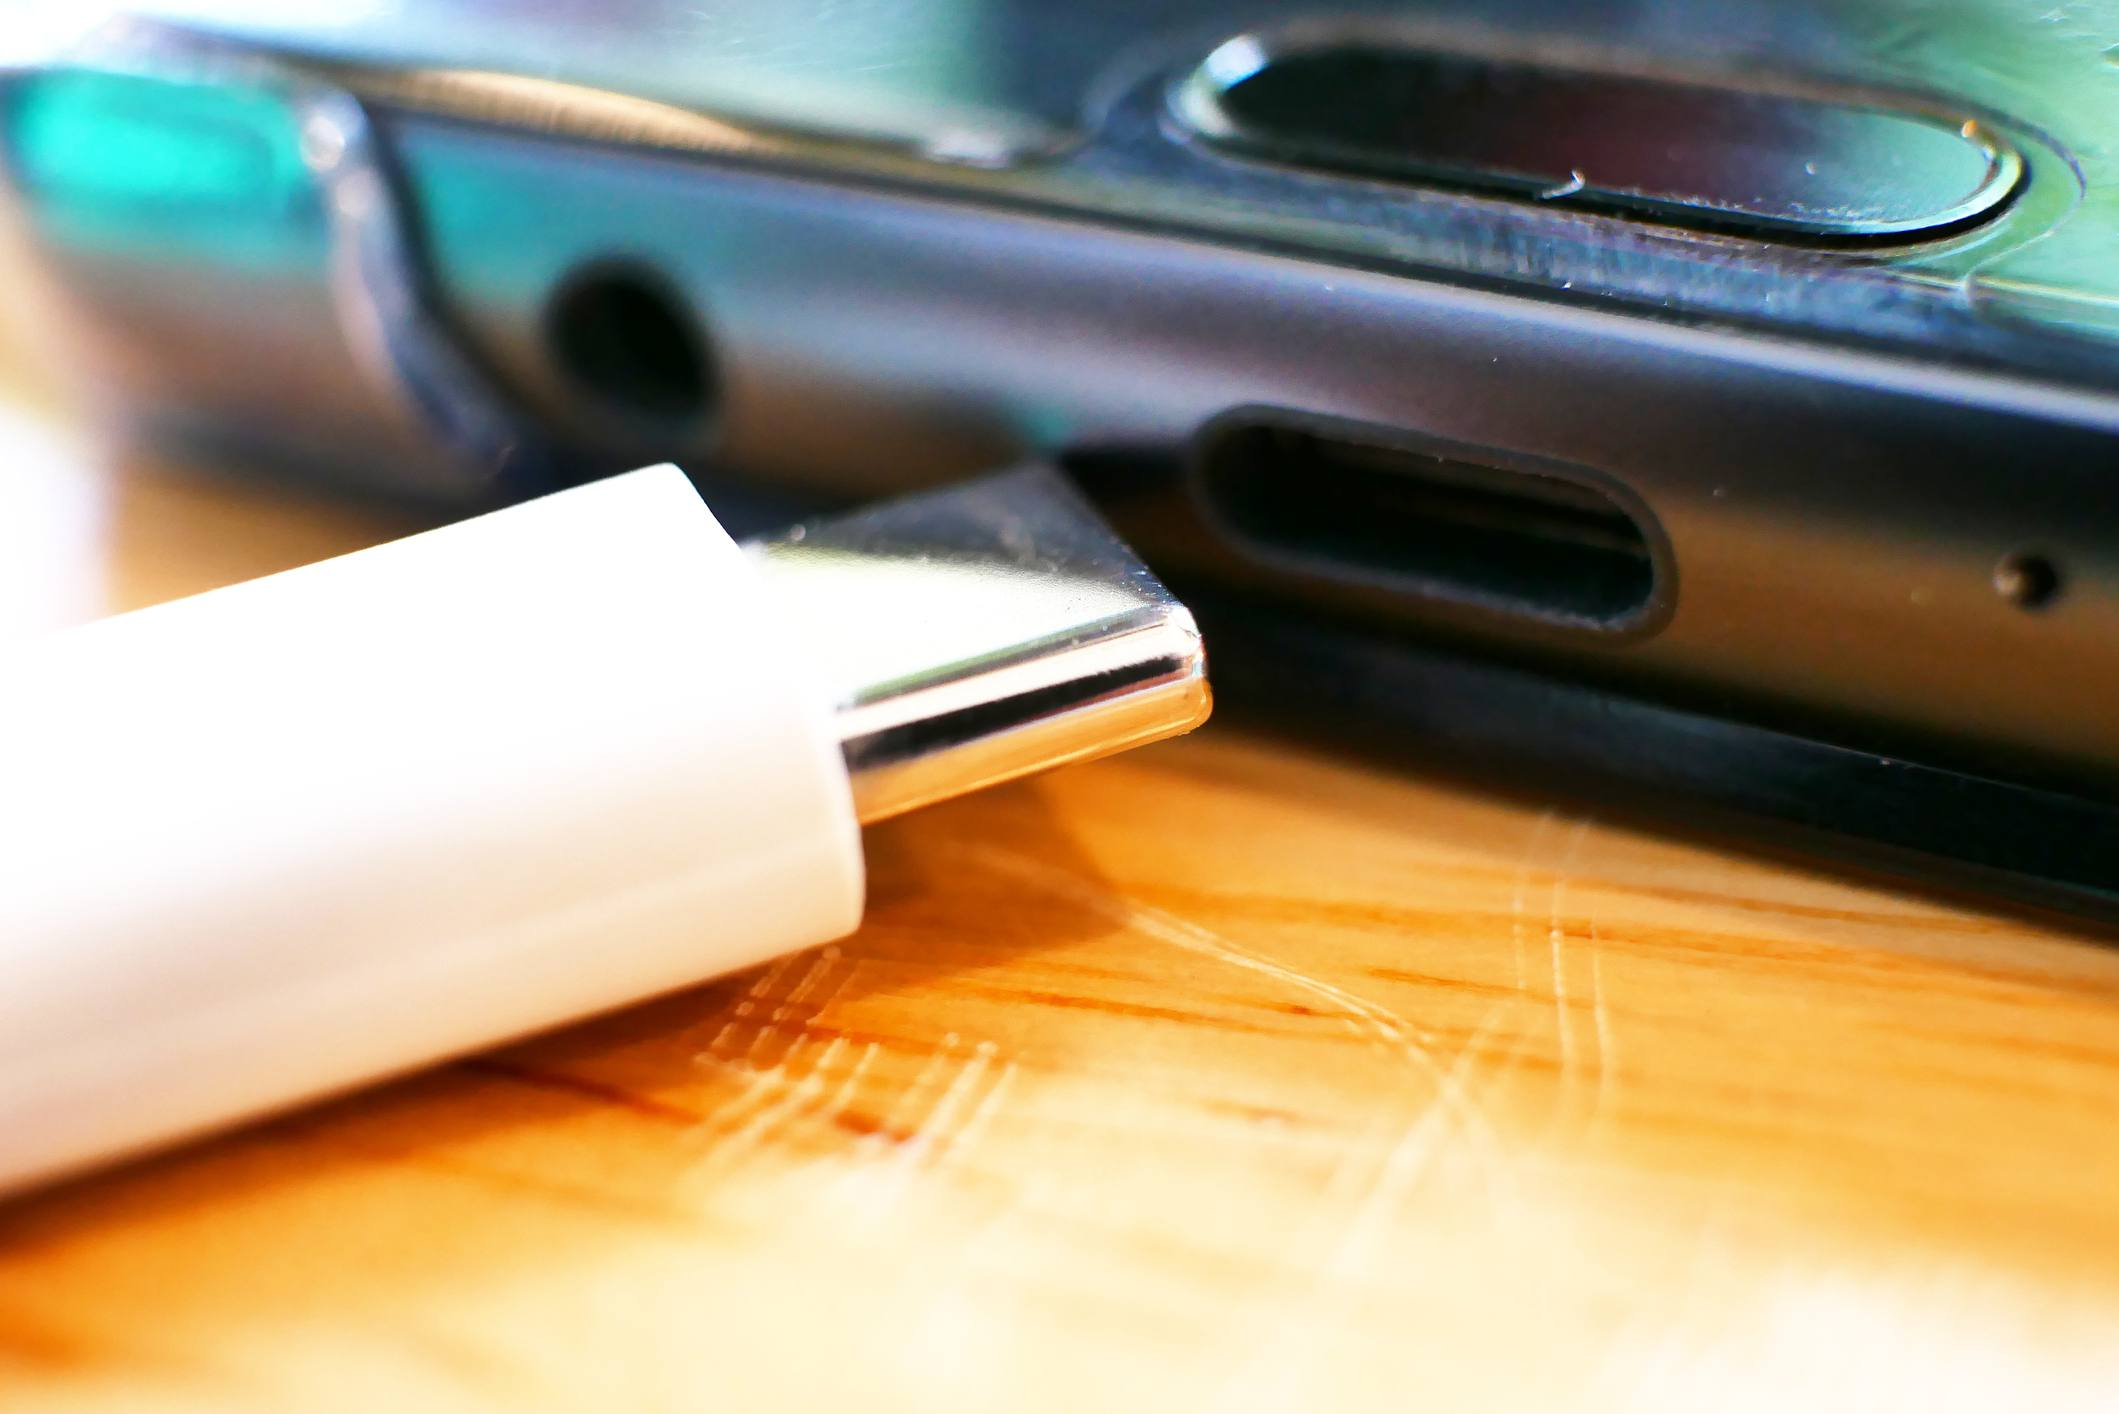 USB-C port found on some Samsung phones.